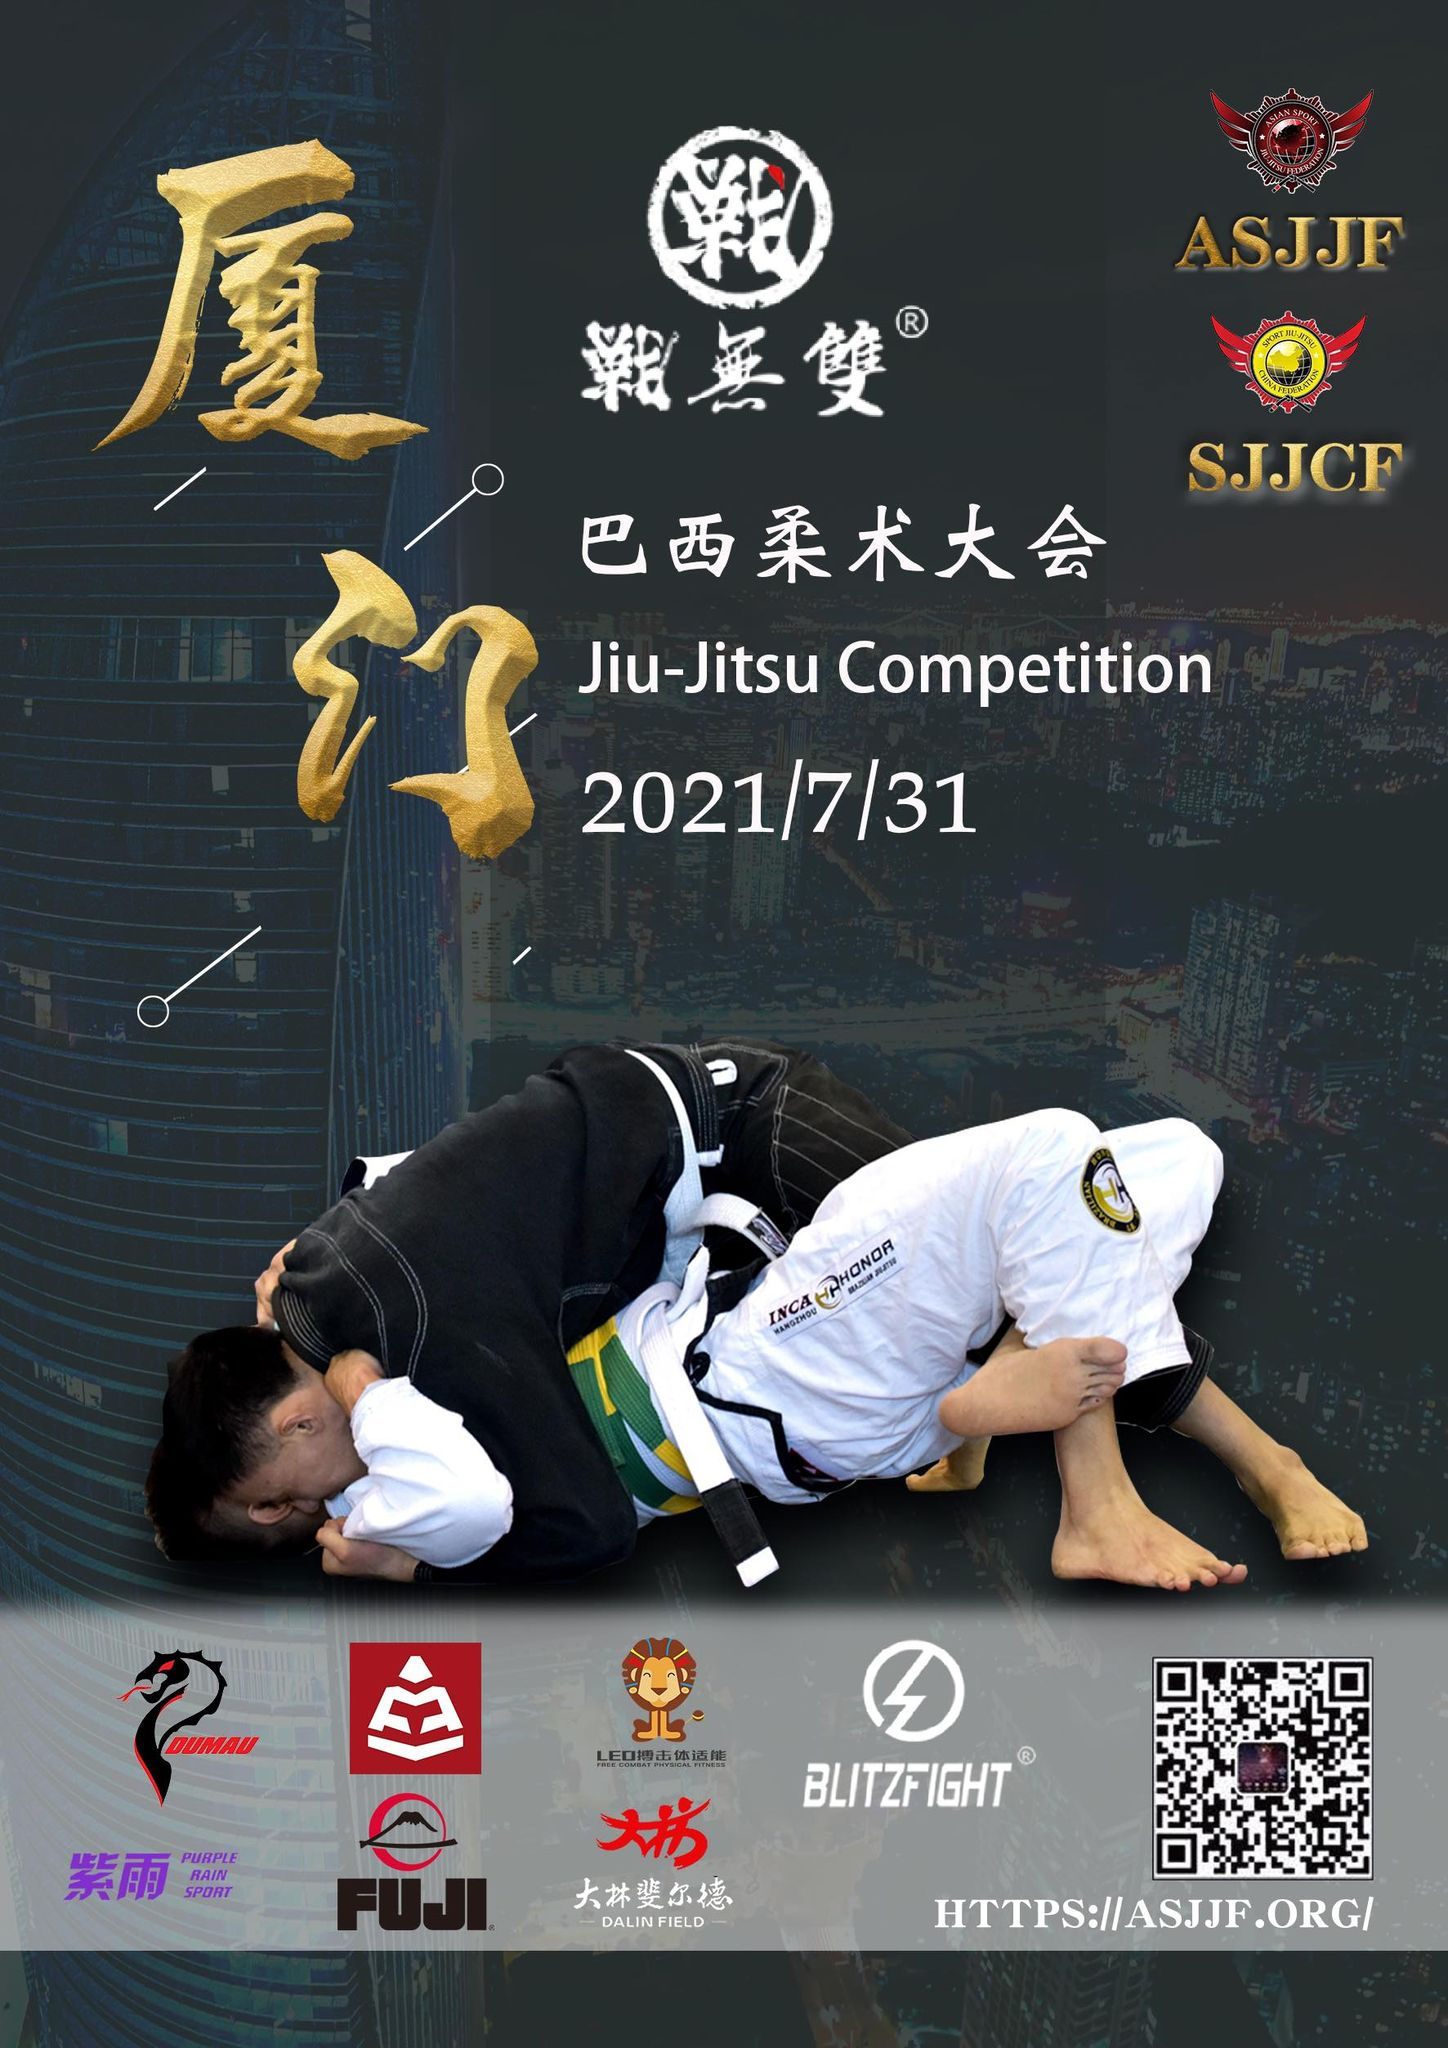 sjjcf xiamen jiu jitsu championship 2021